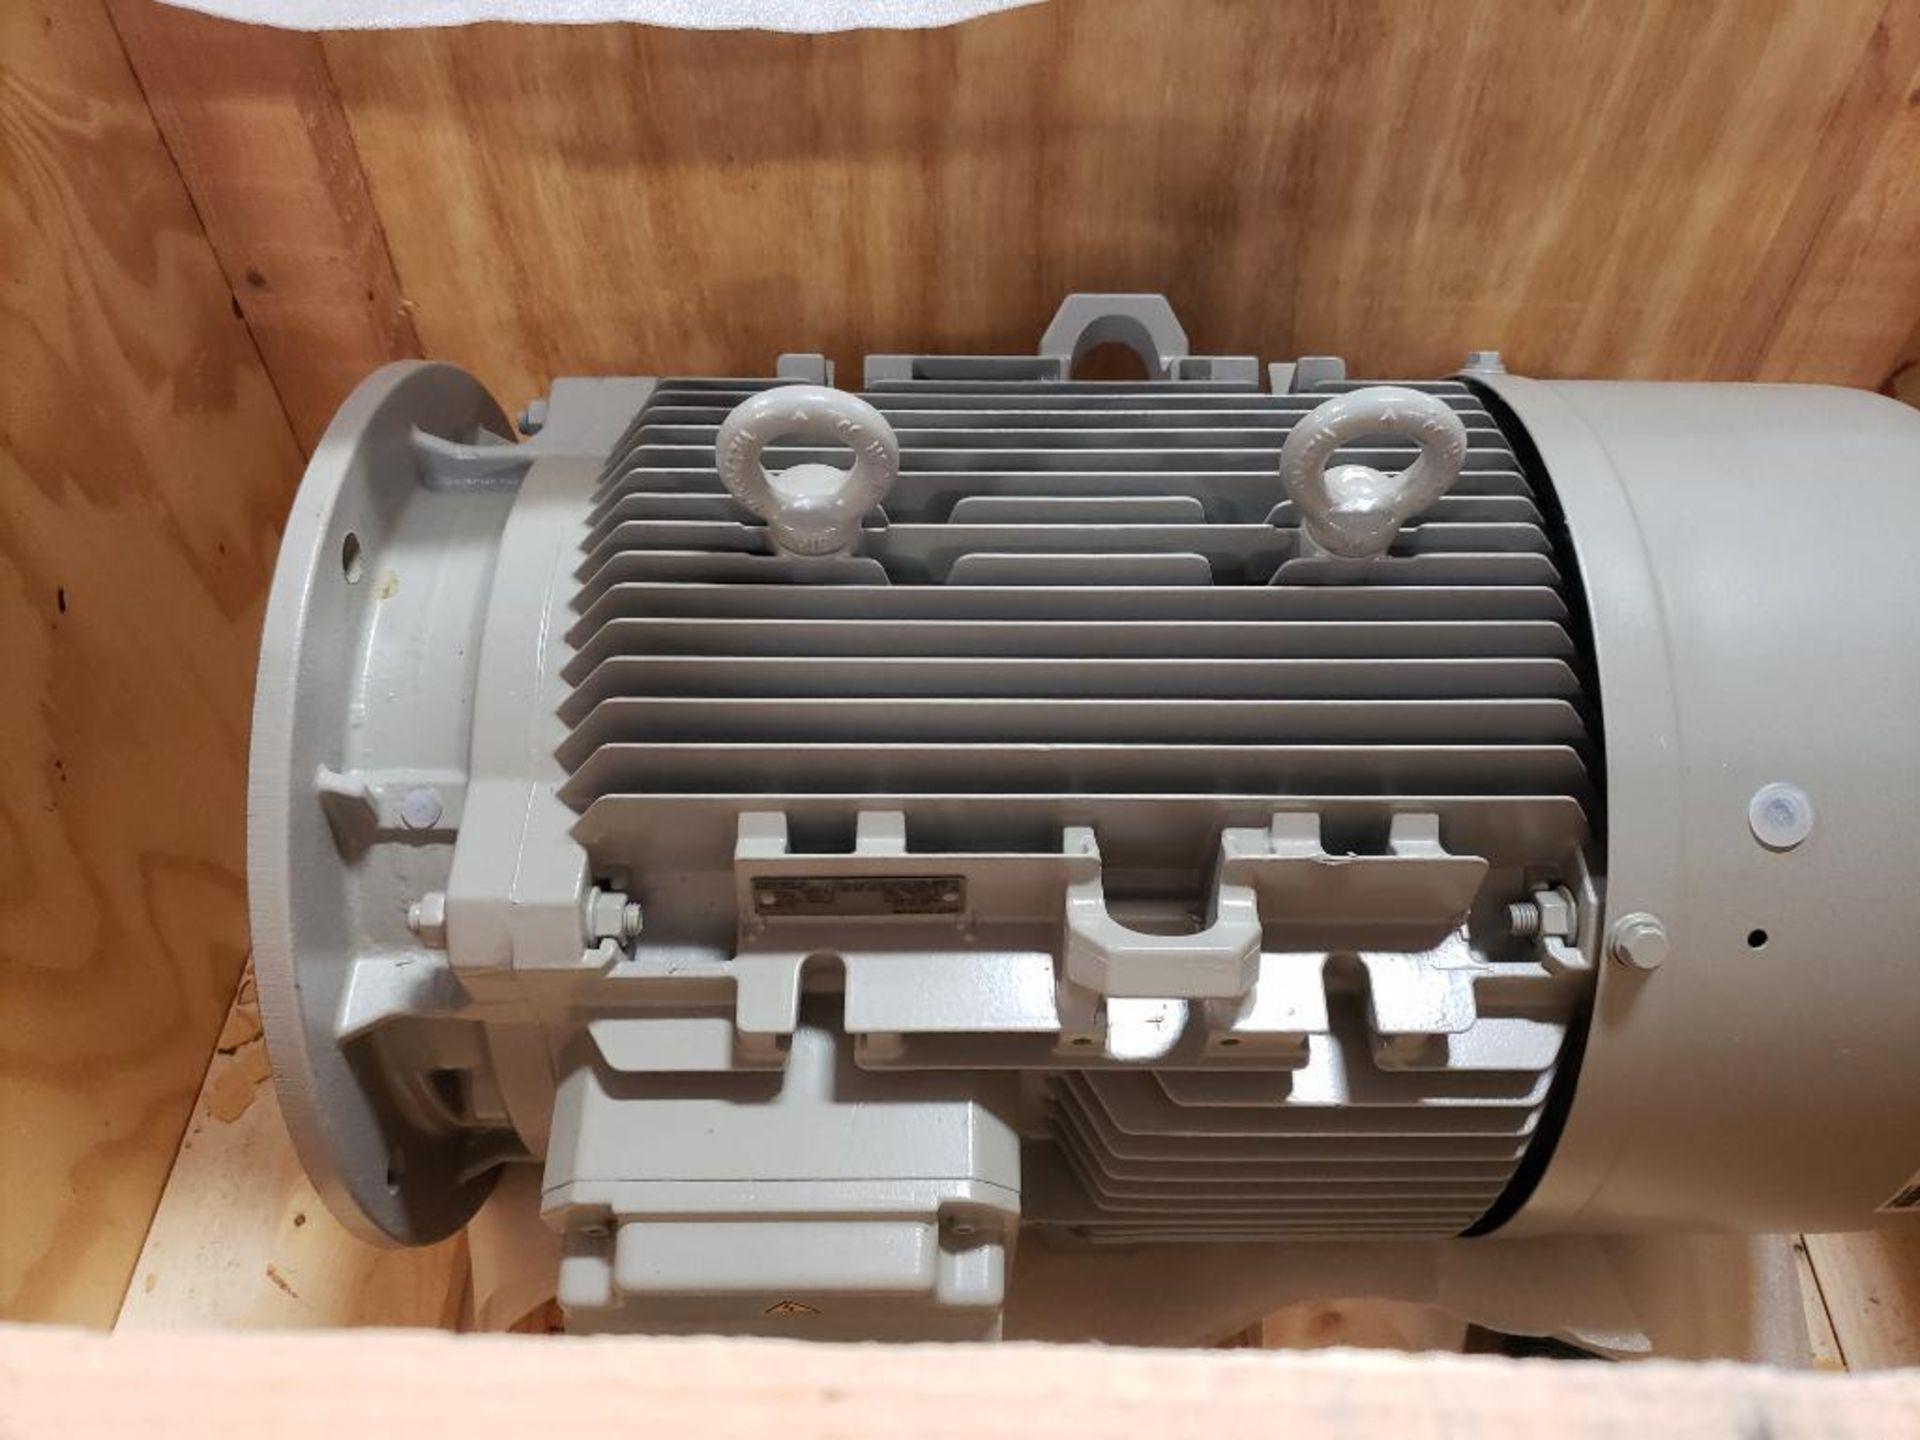 45kW Siemens 3PH motor. 1LA92092AA91-ZT56. 200V, 2965RPM. - Image 2 of 9